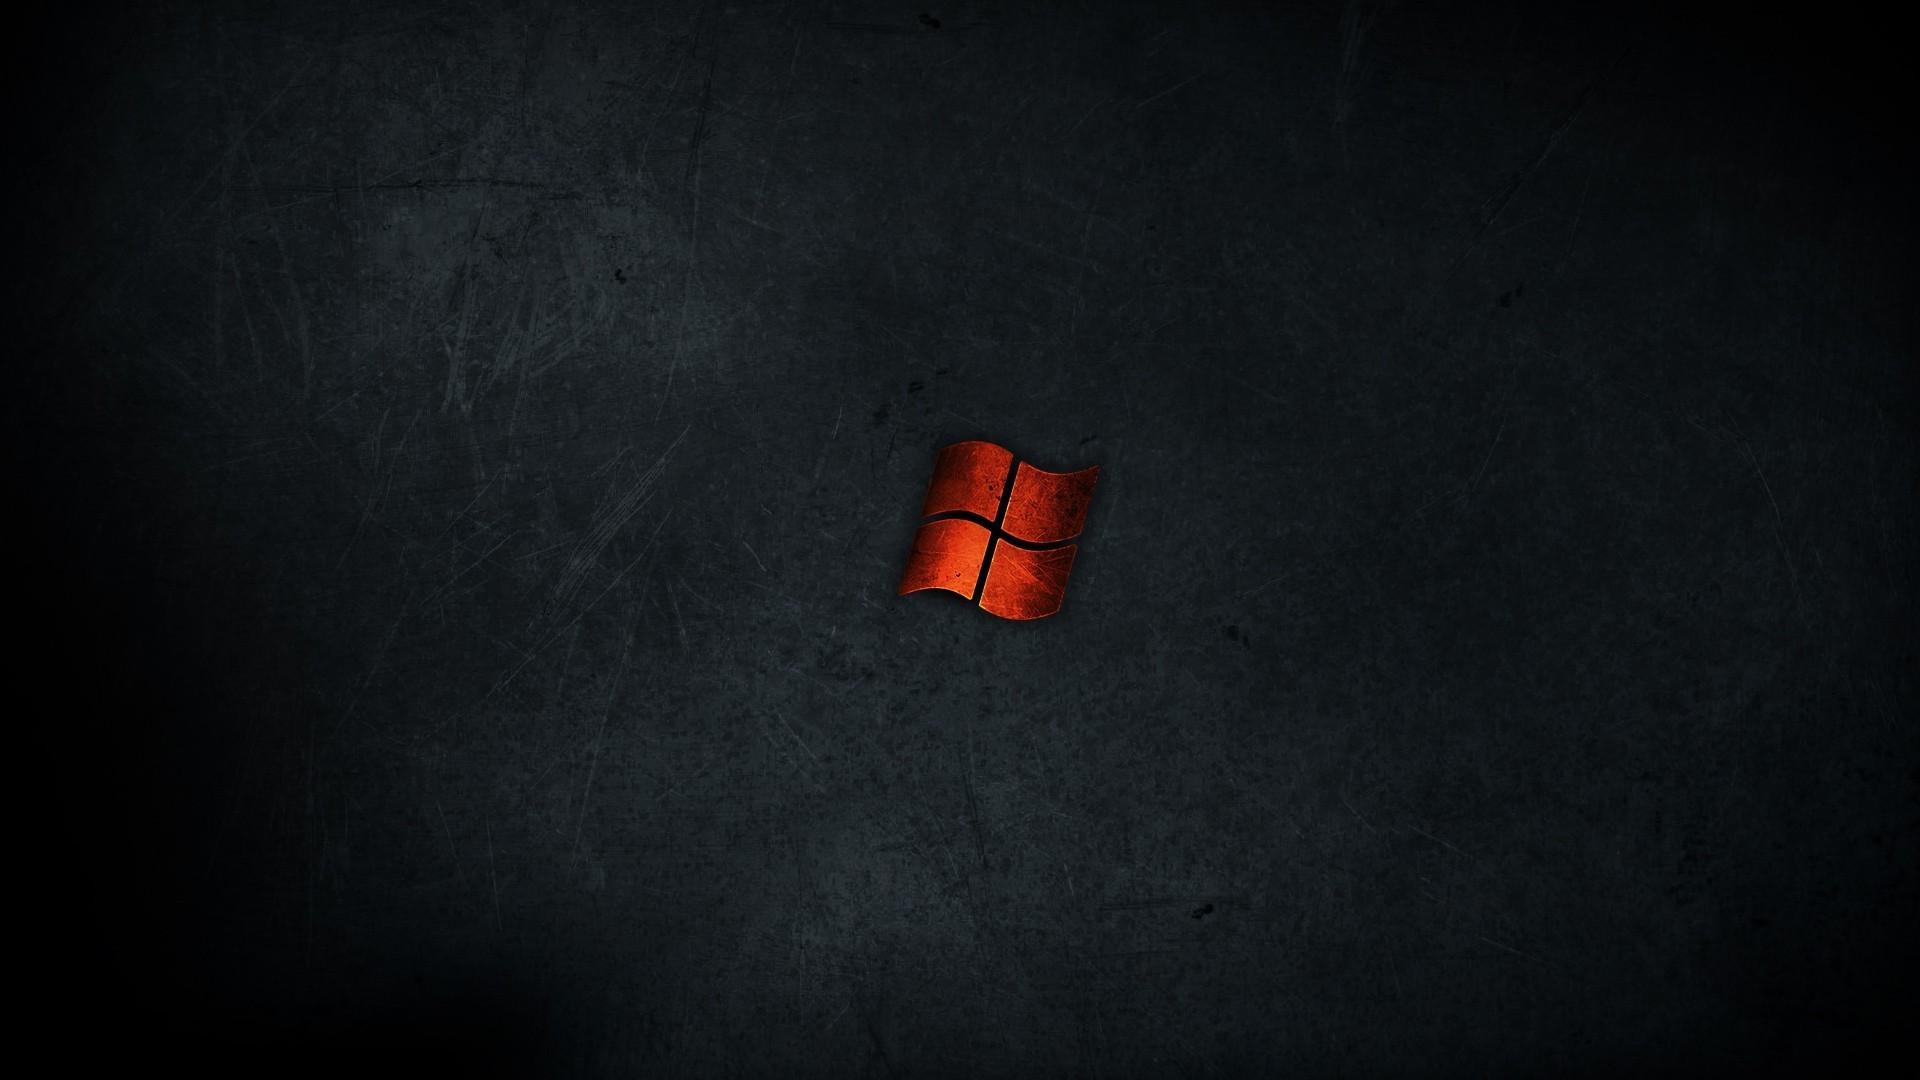 4k Windows 10